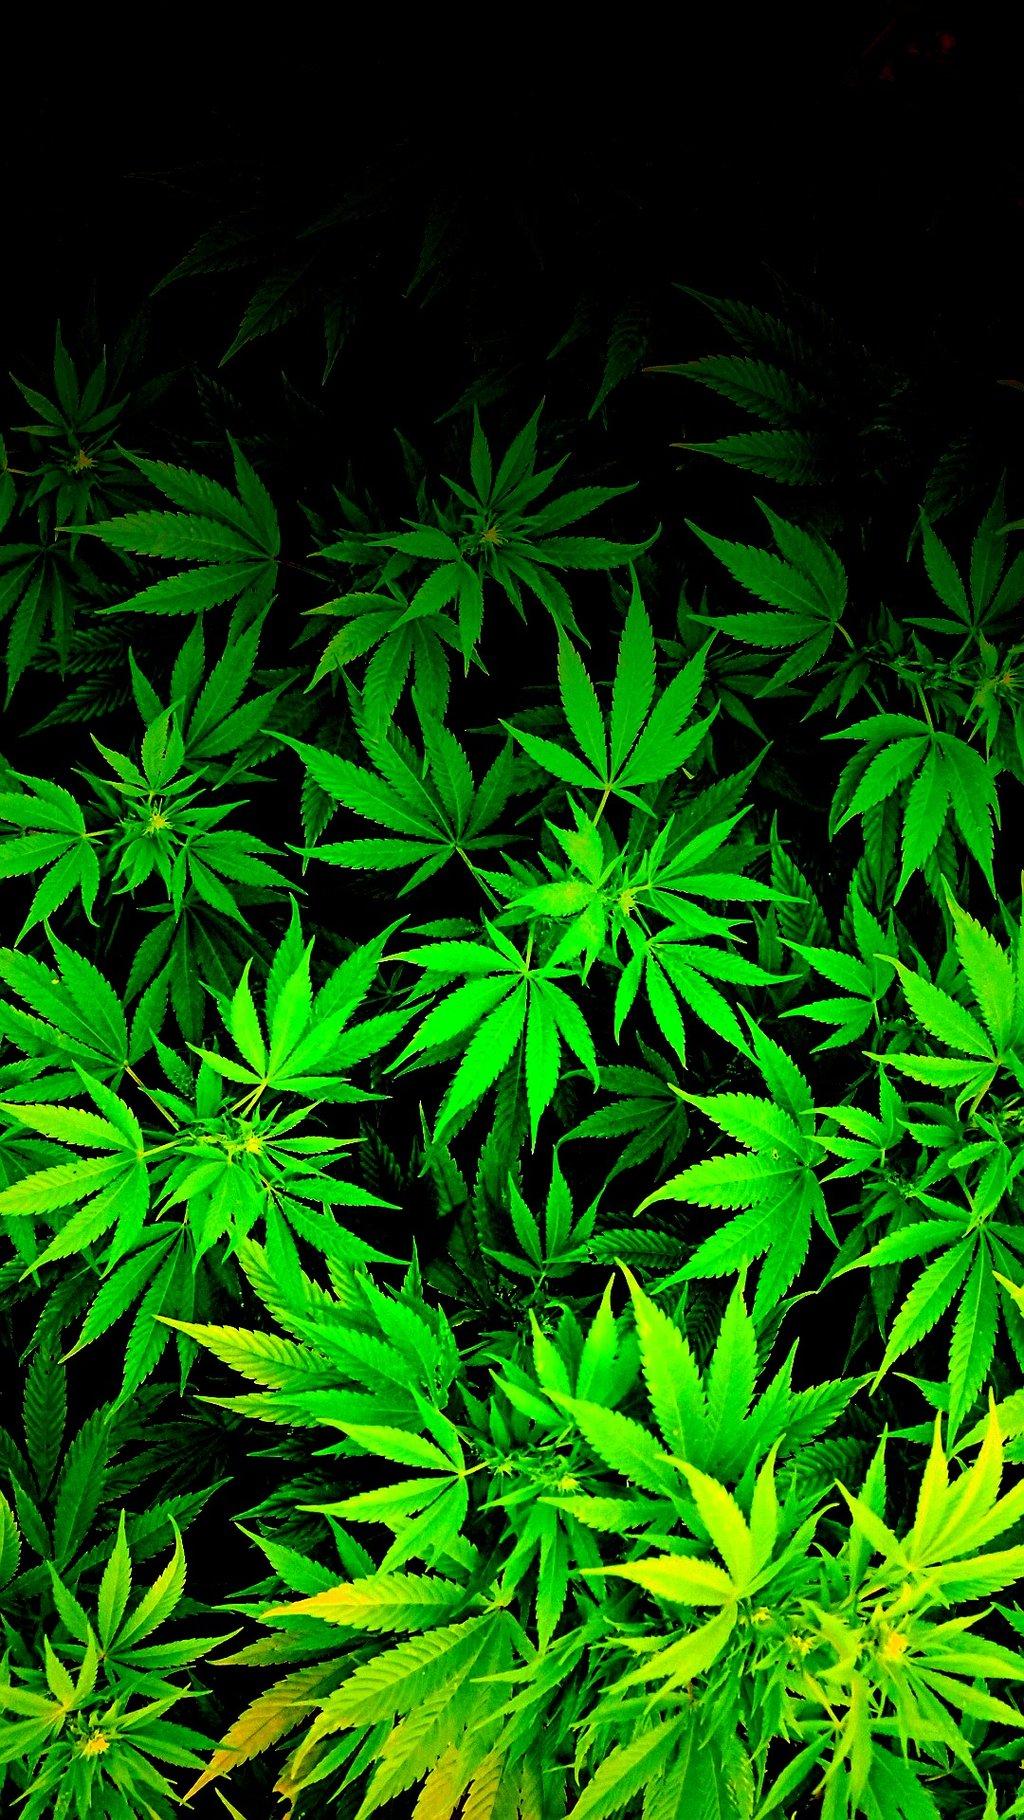 iPod iPhone weed marijuana cannabis Wallpaper by thetruemask on 1024x1820